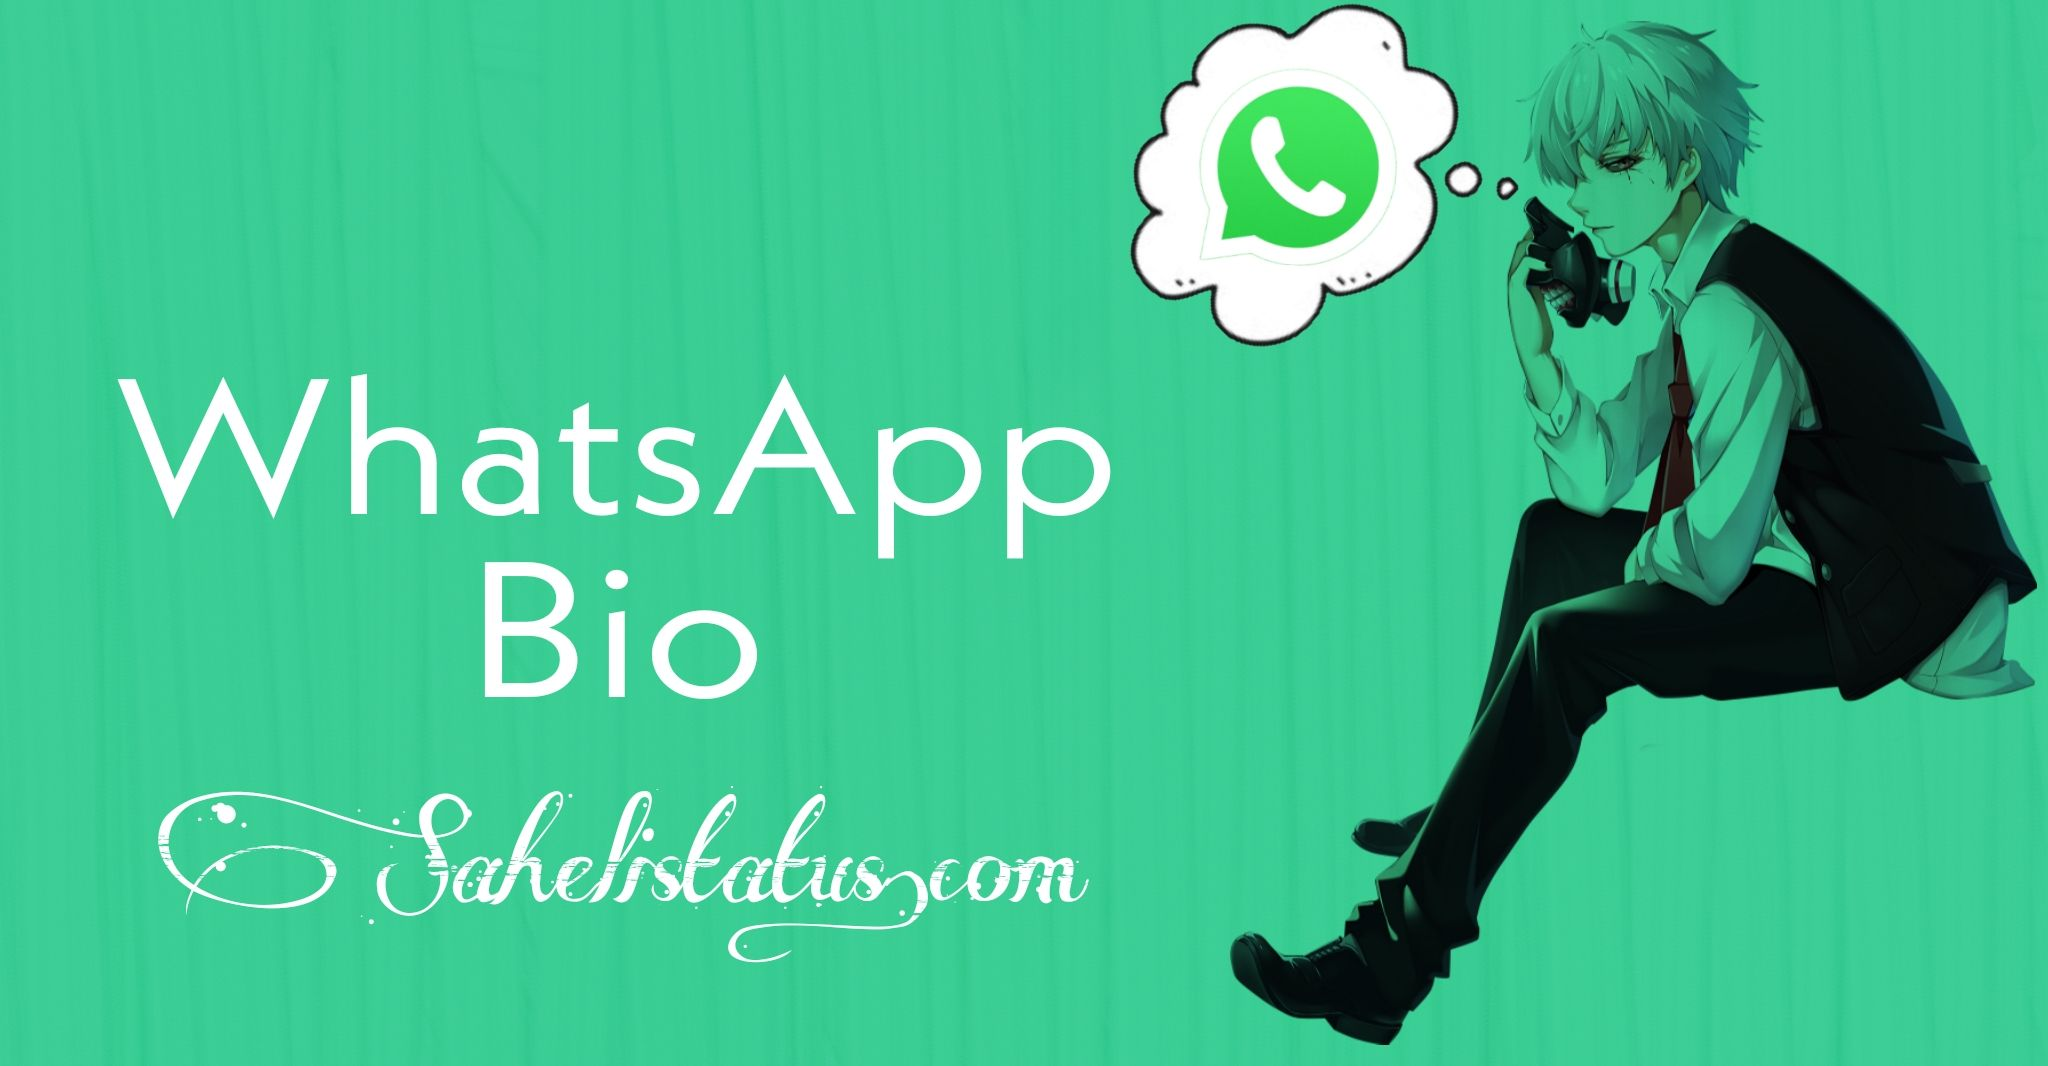 Whatsapp Bio , Funny Whatsapp Bio, Love Whatsapp Bio, Motivational  Whatsapp Bios,